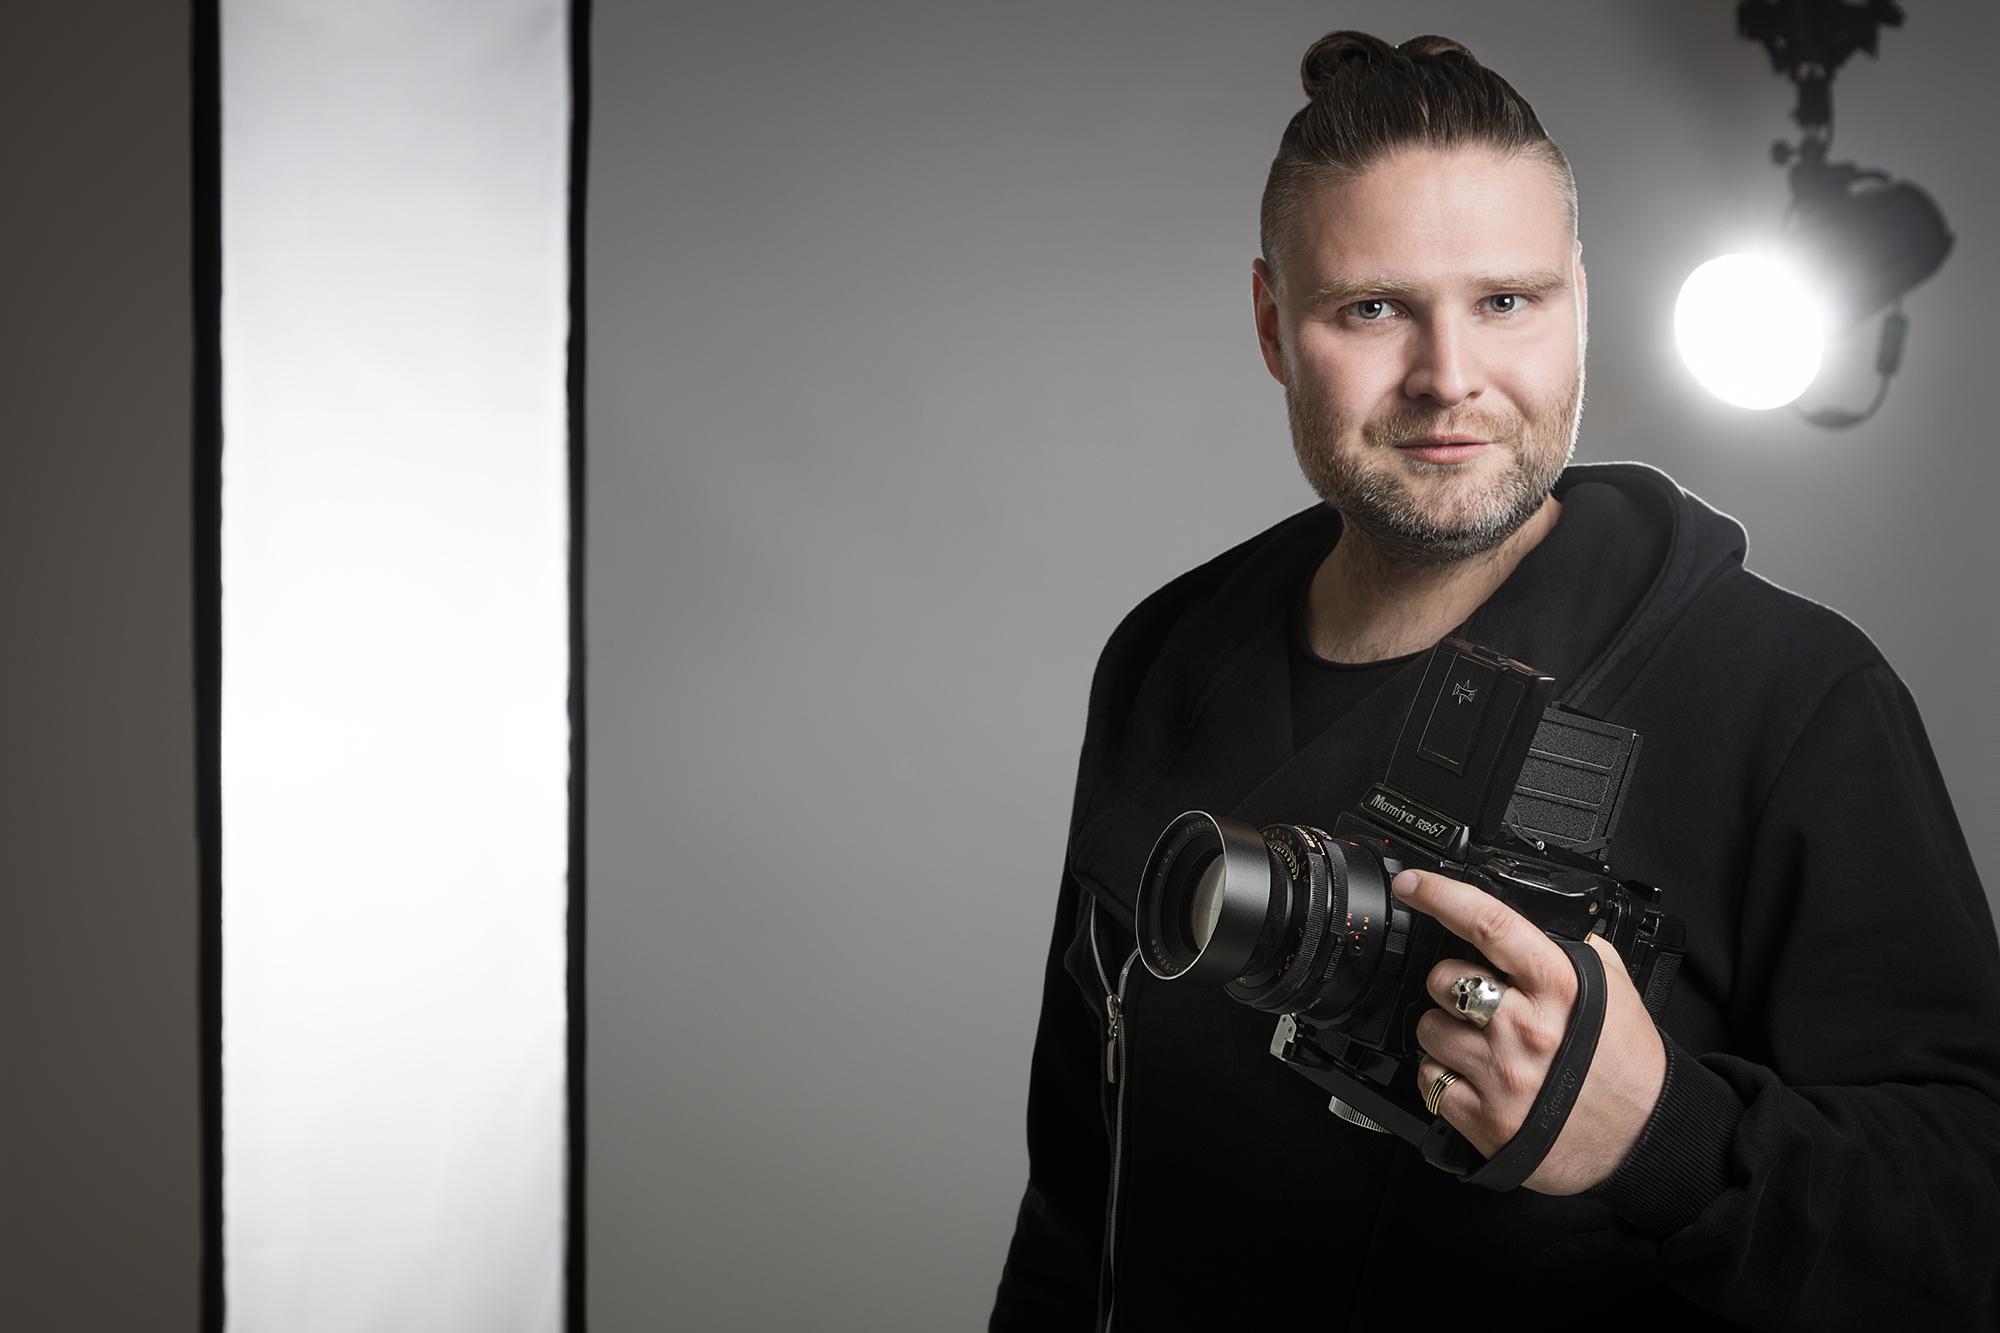 Autoportret_Ivo_Ledwozyw